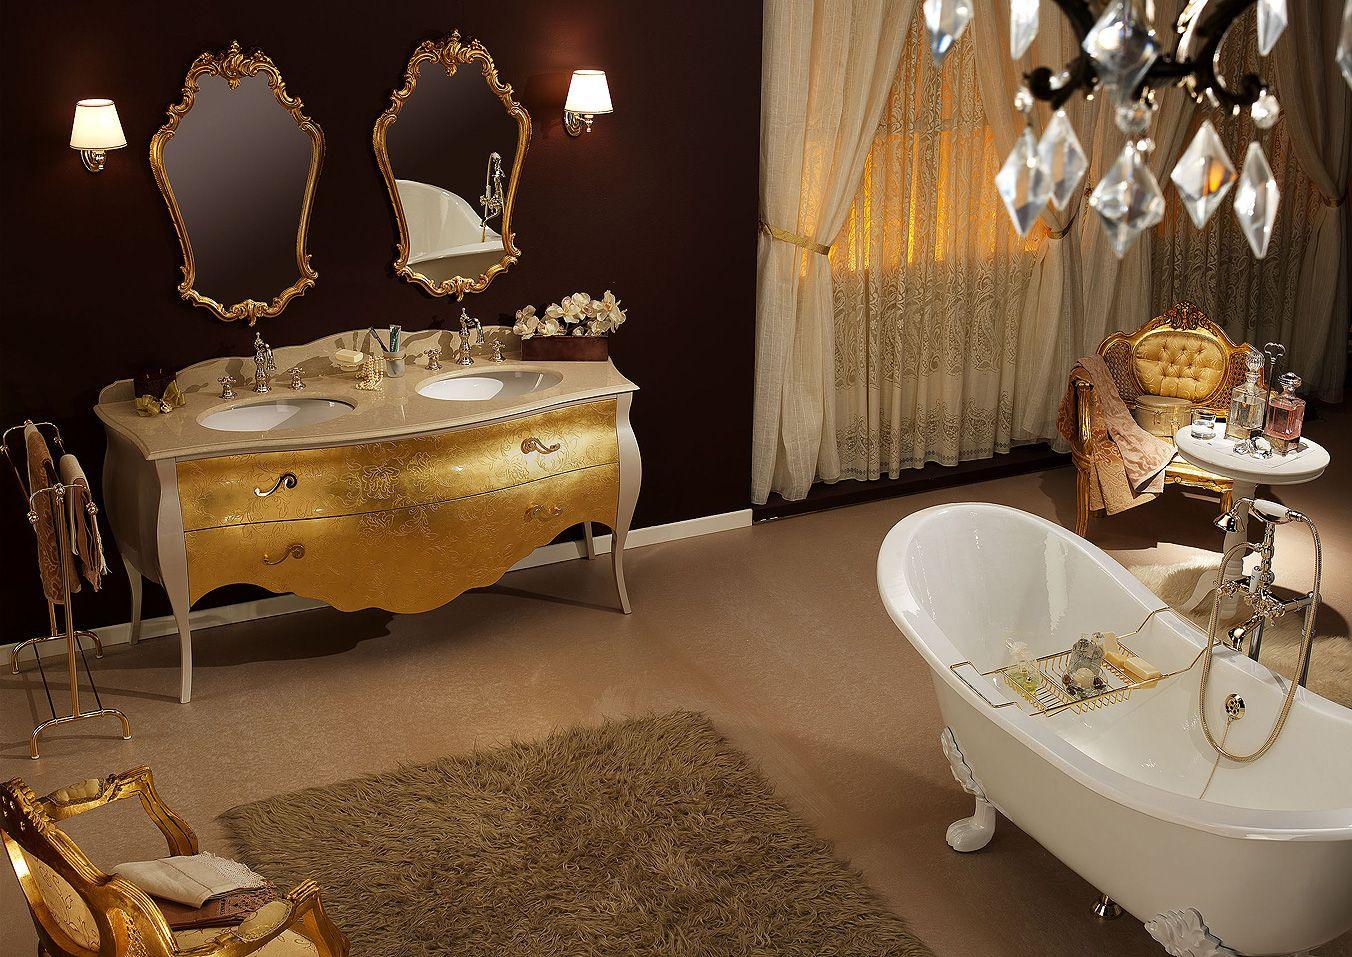 Ferrara emilia bagni di lusso pavimenti rivestimenti - Accessori da bagno di lusso ...